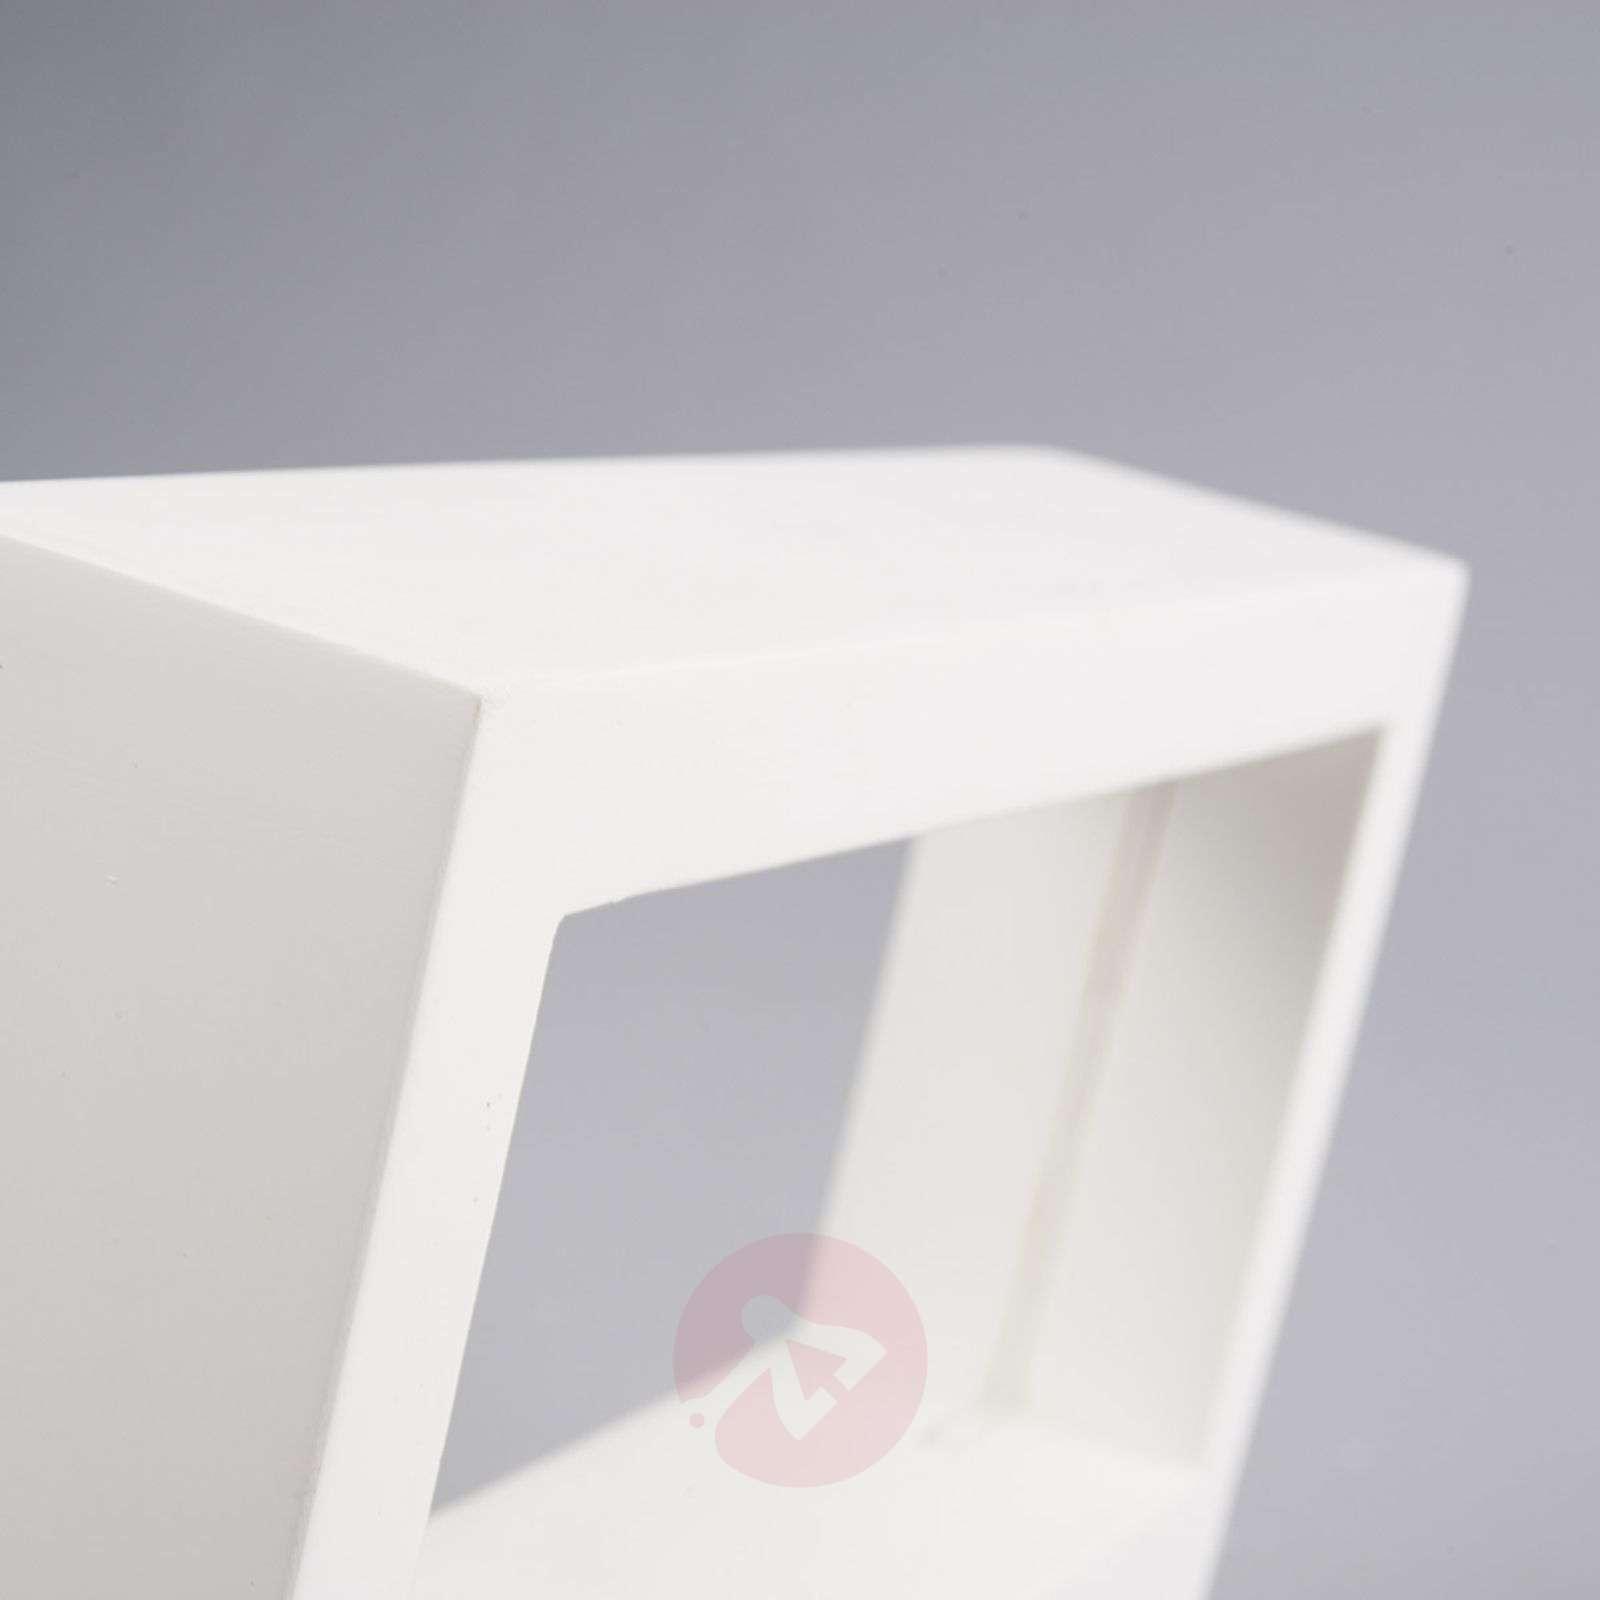 Julika LED Wall Light Plaster-9613018-01